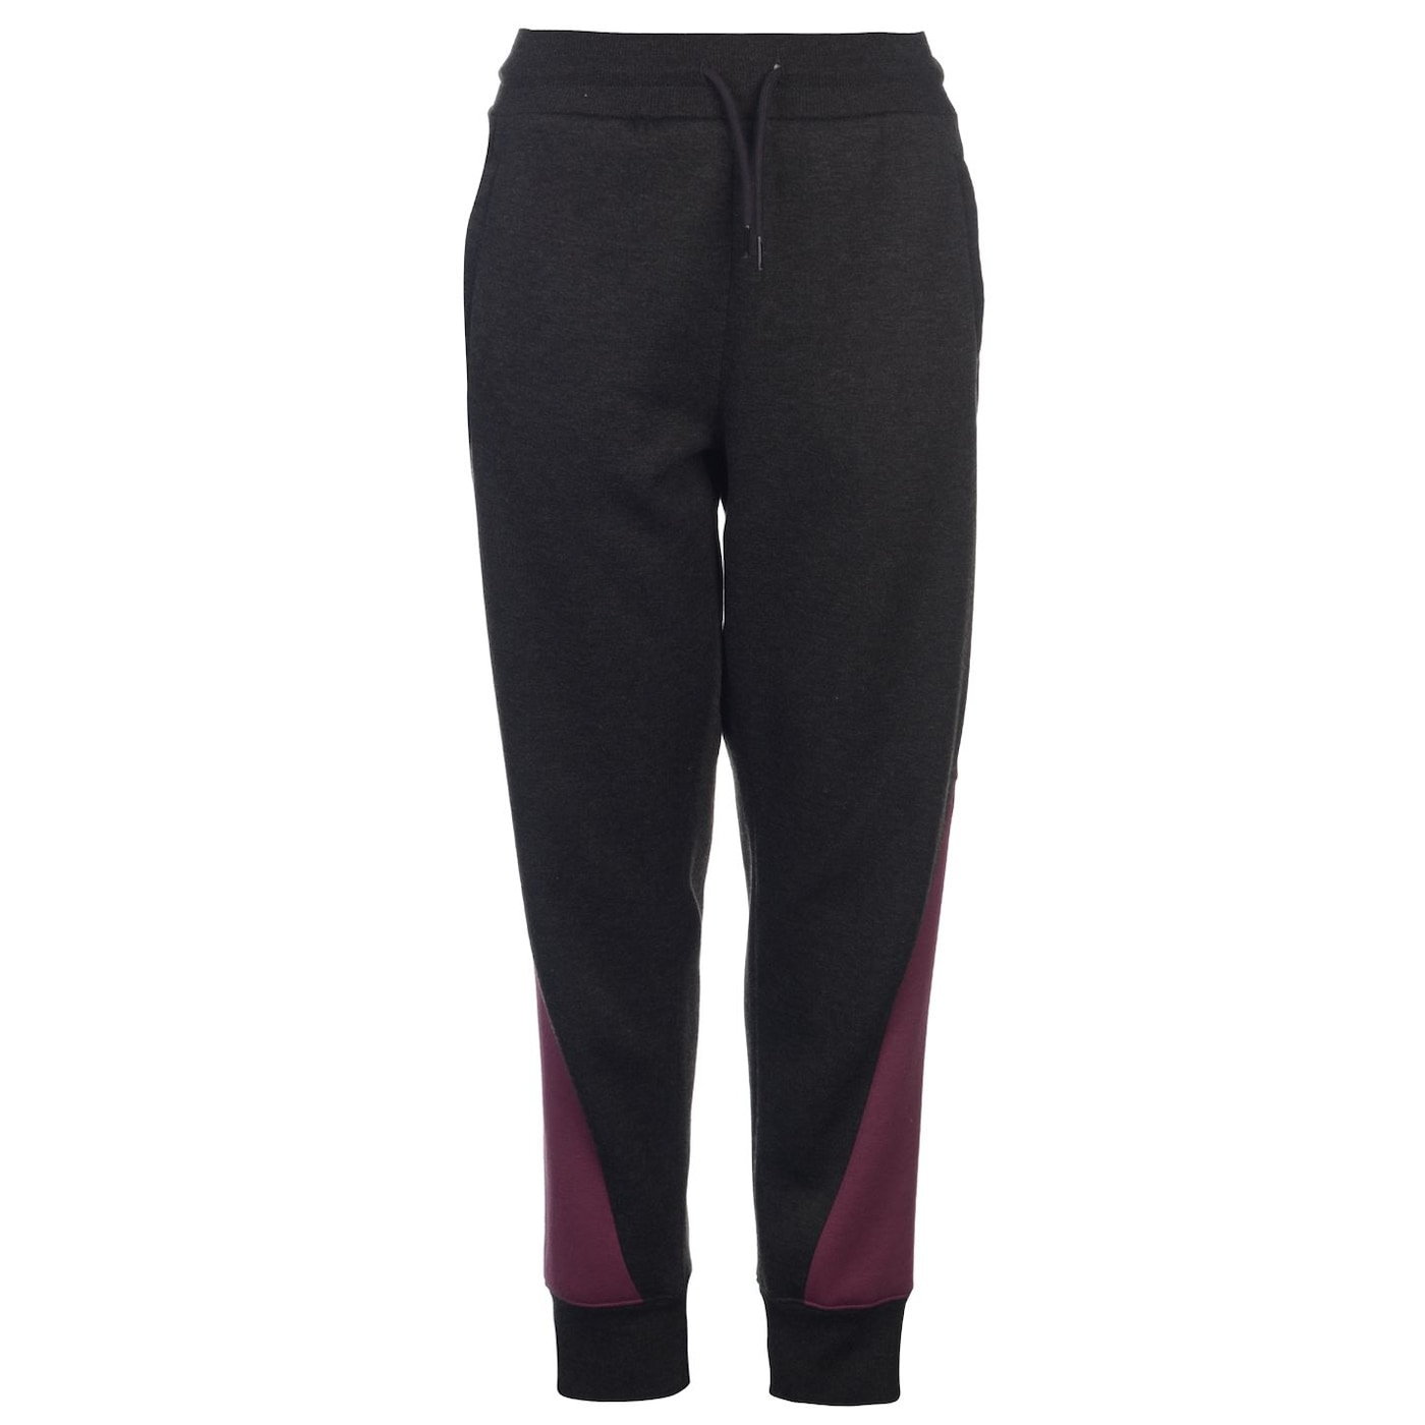 LA Gear Cut and Sew Jogging Pants Ladies